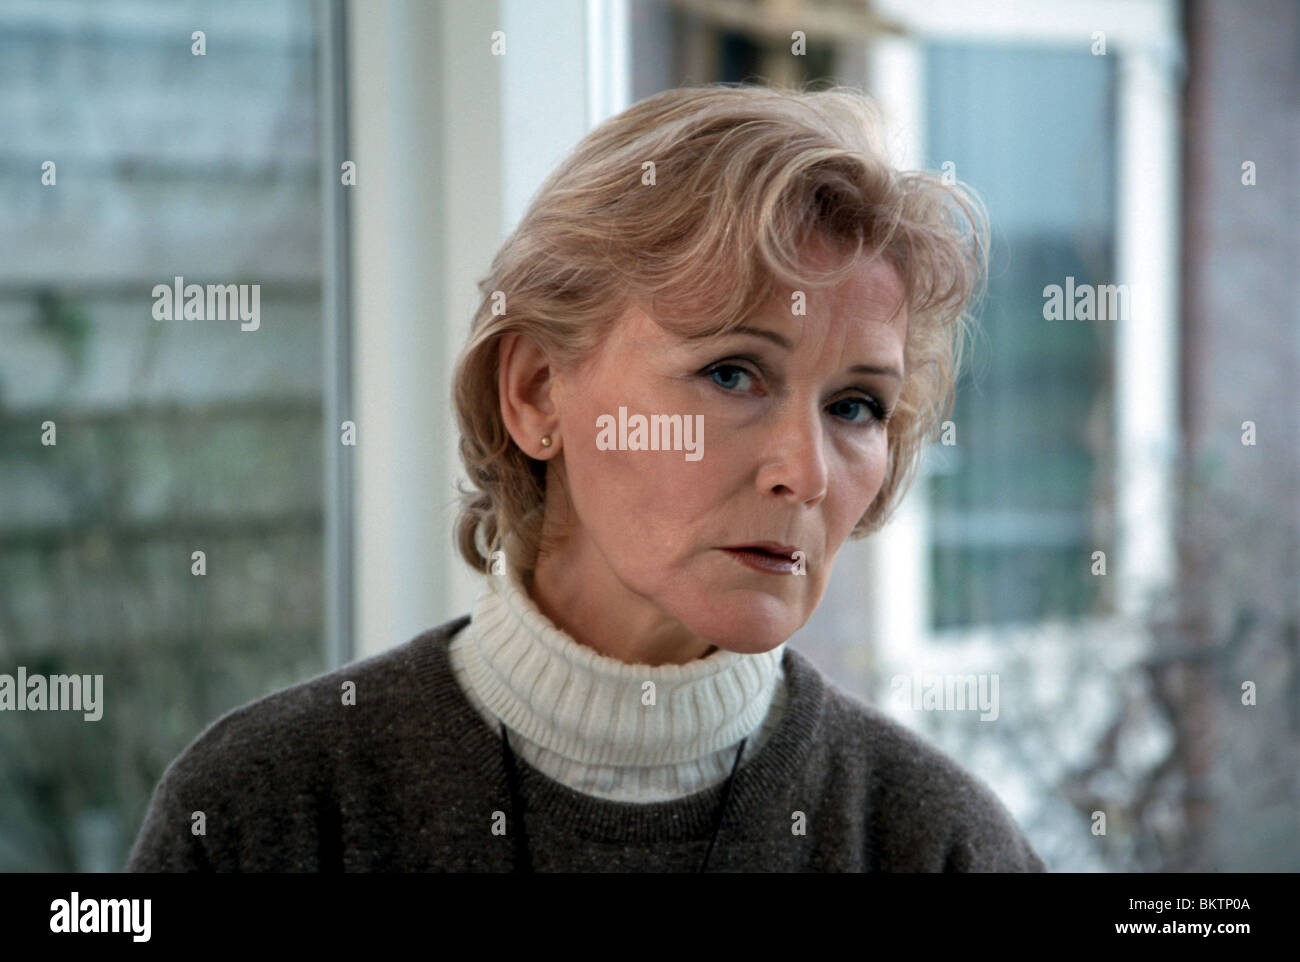 Senior woman thinking - Stock Image